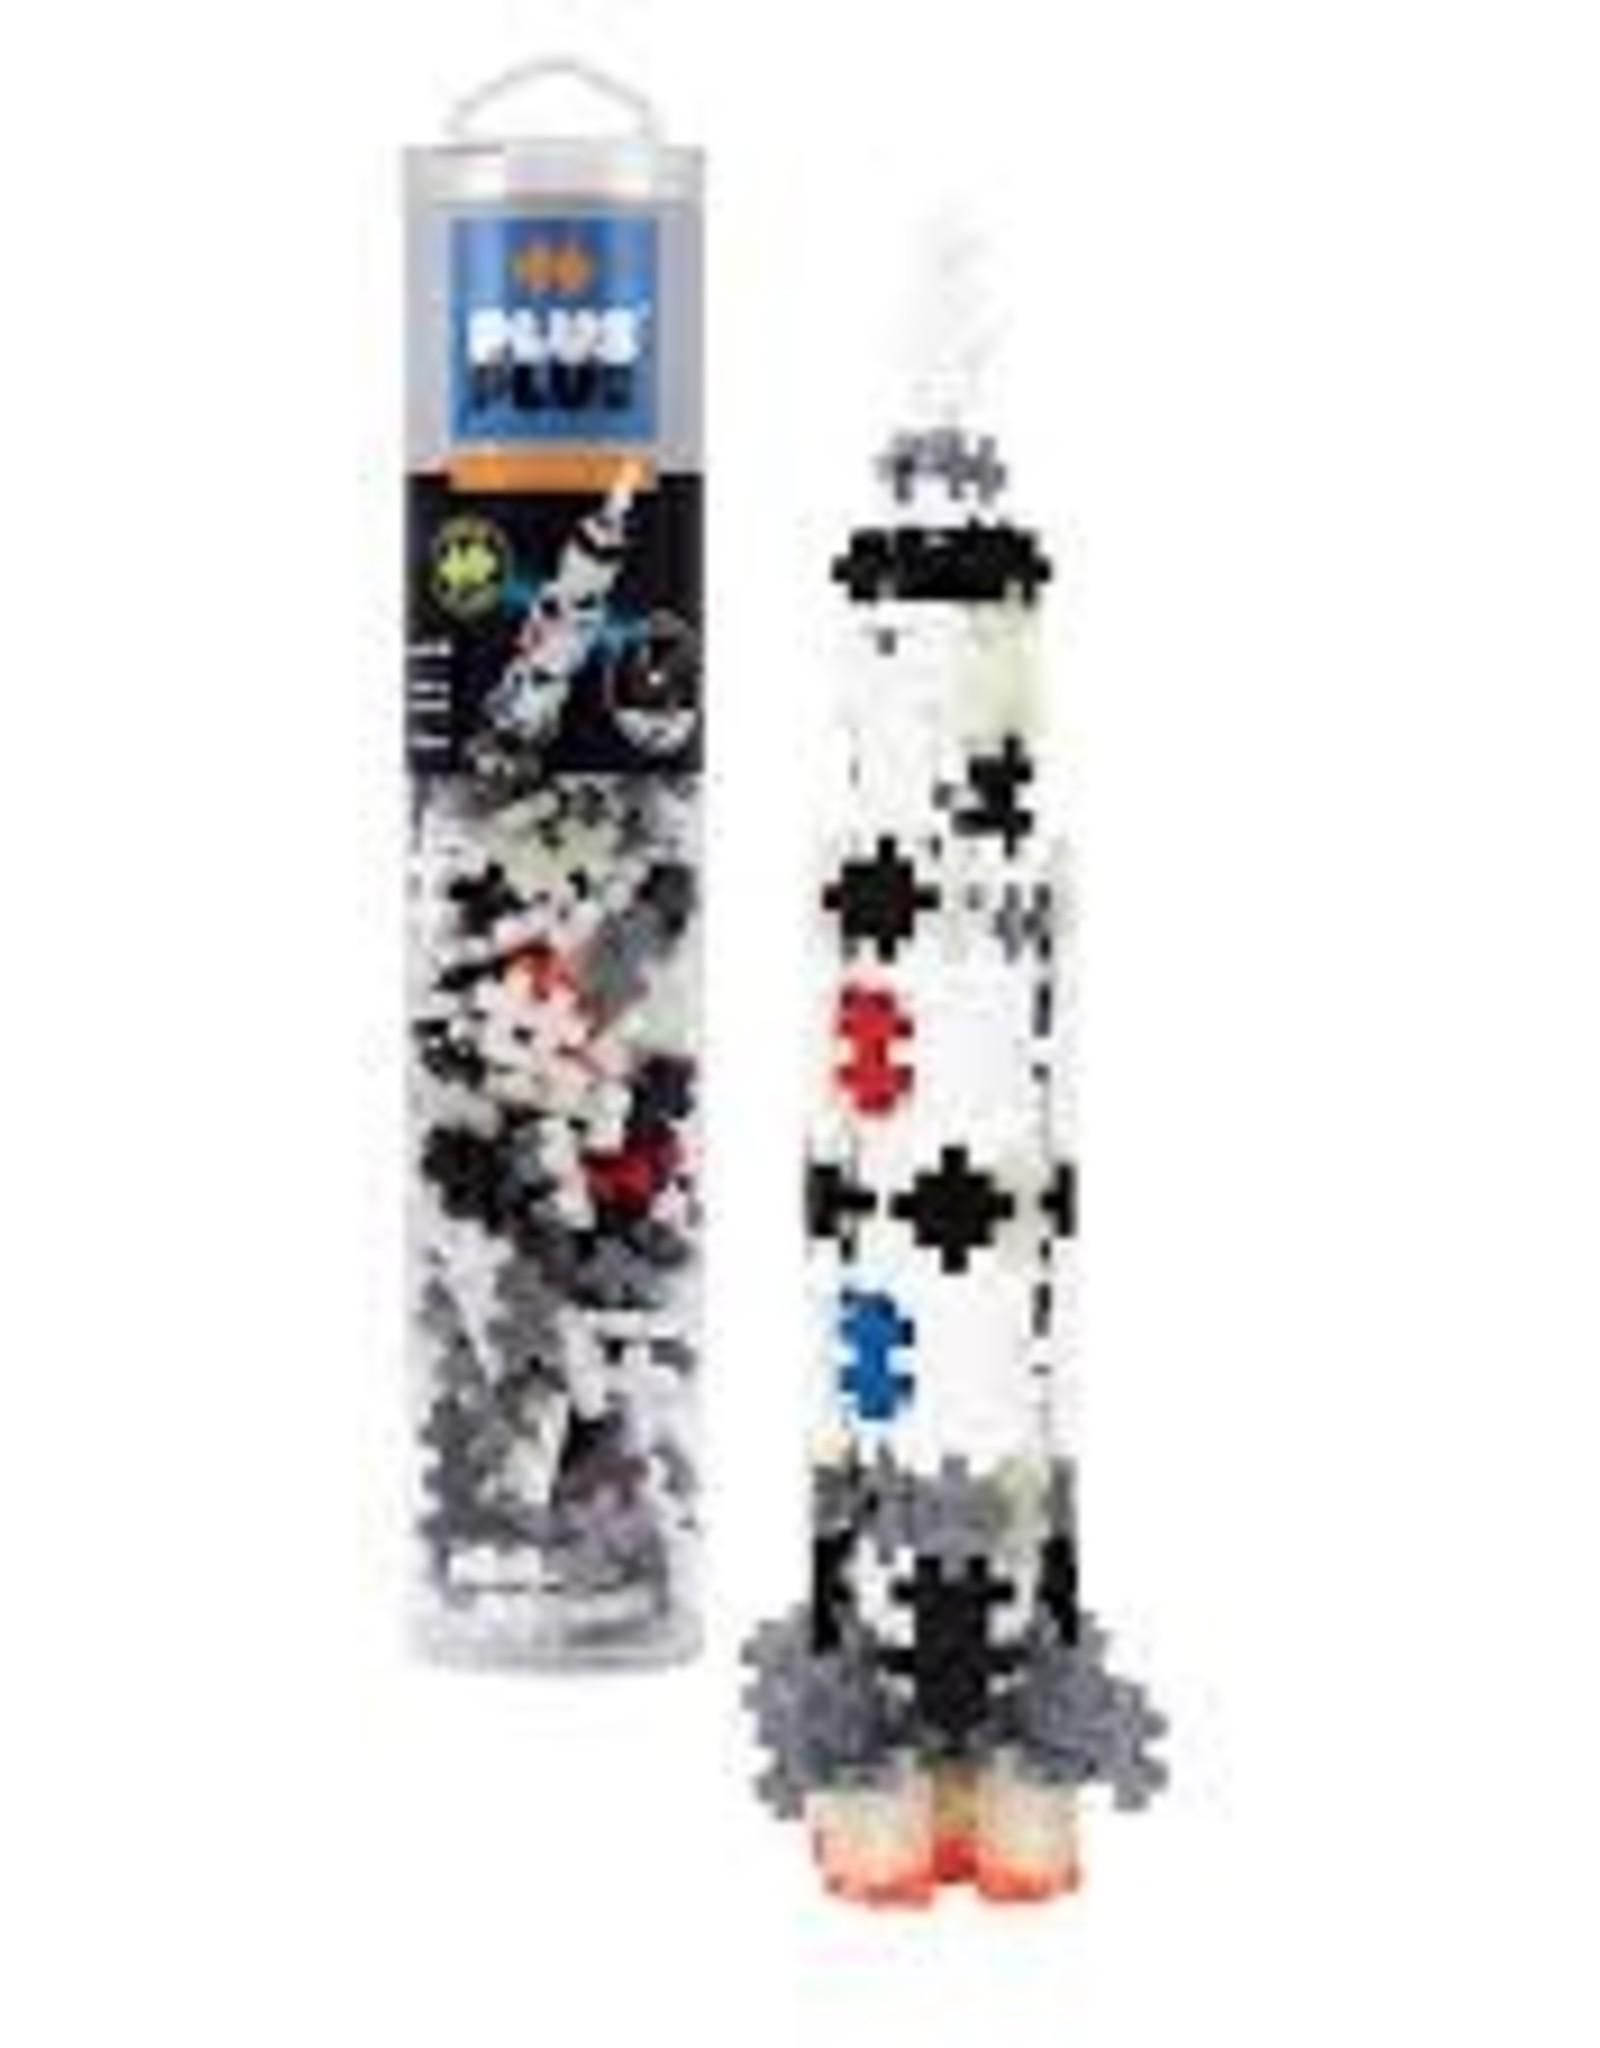 Plus Plus Plus Plus Tube Rocket - 240pc